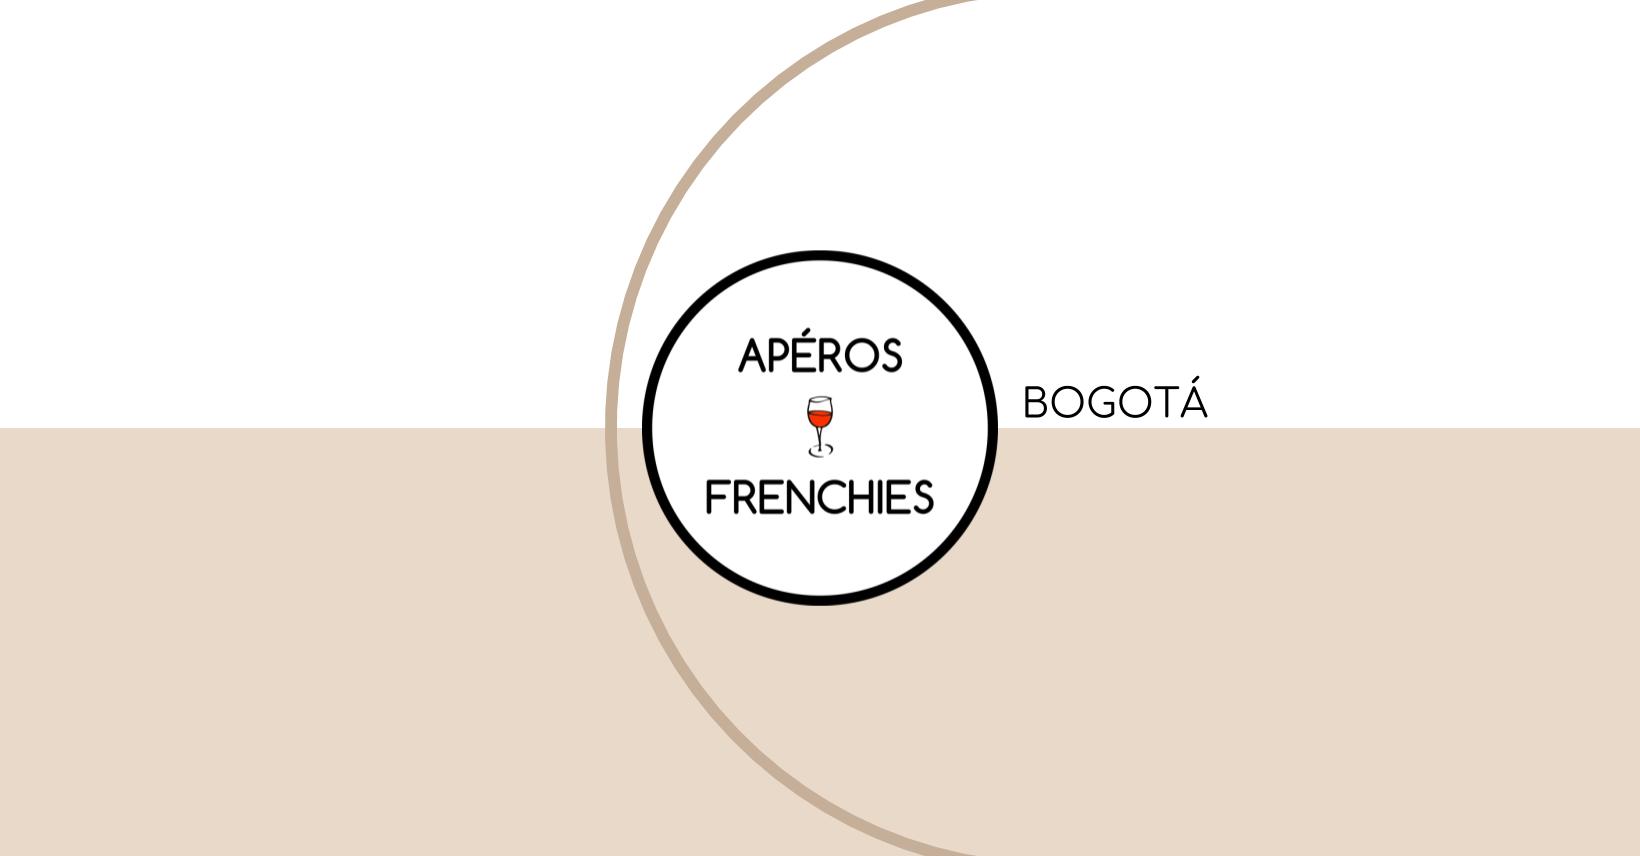 aperosfrenchies-bogota-cover